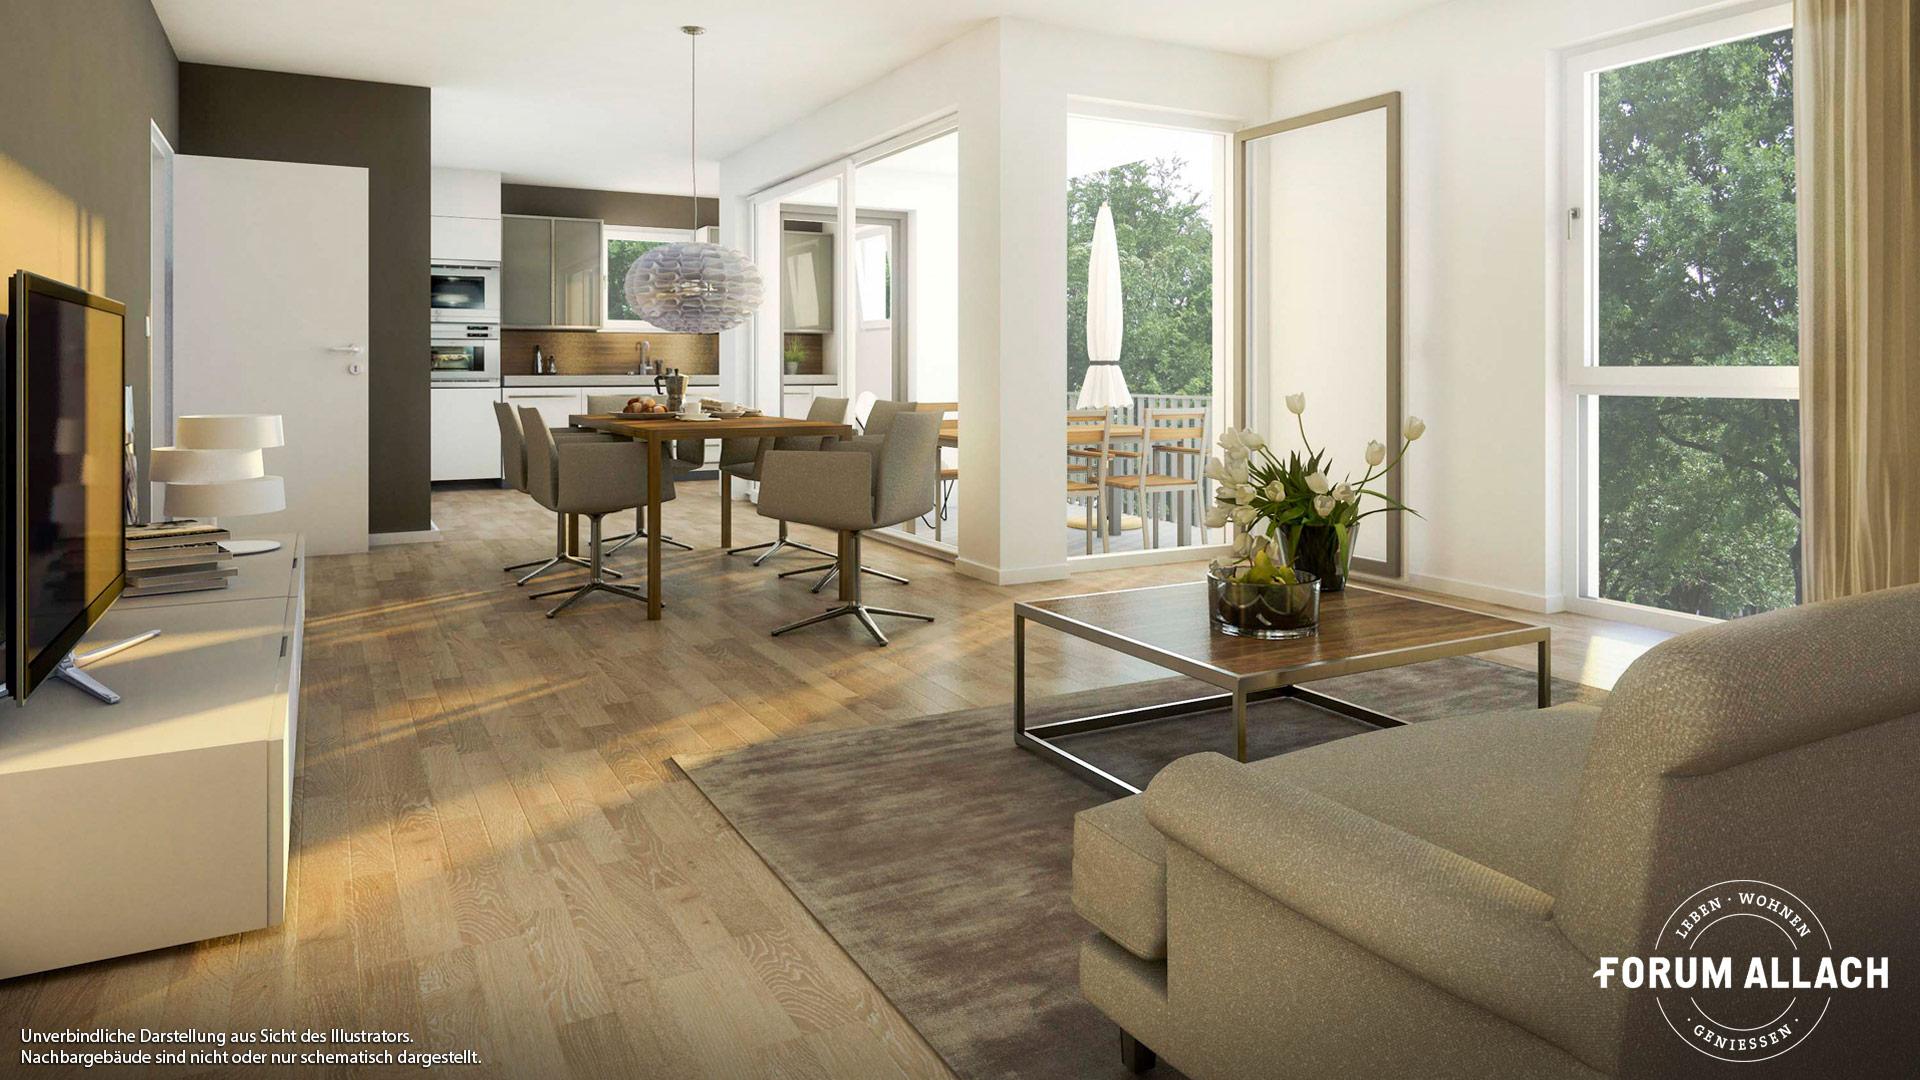 Immobilie Forum Allach - Illustration 7